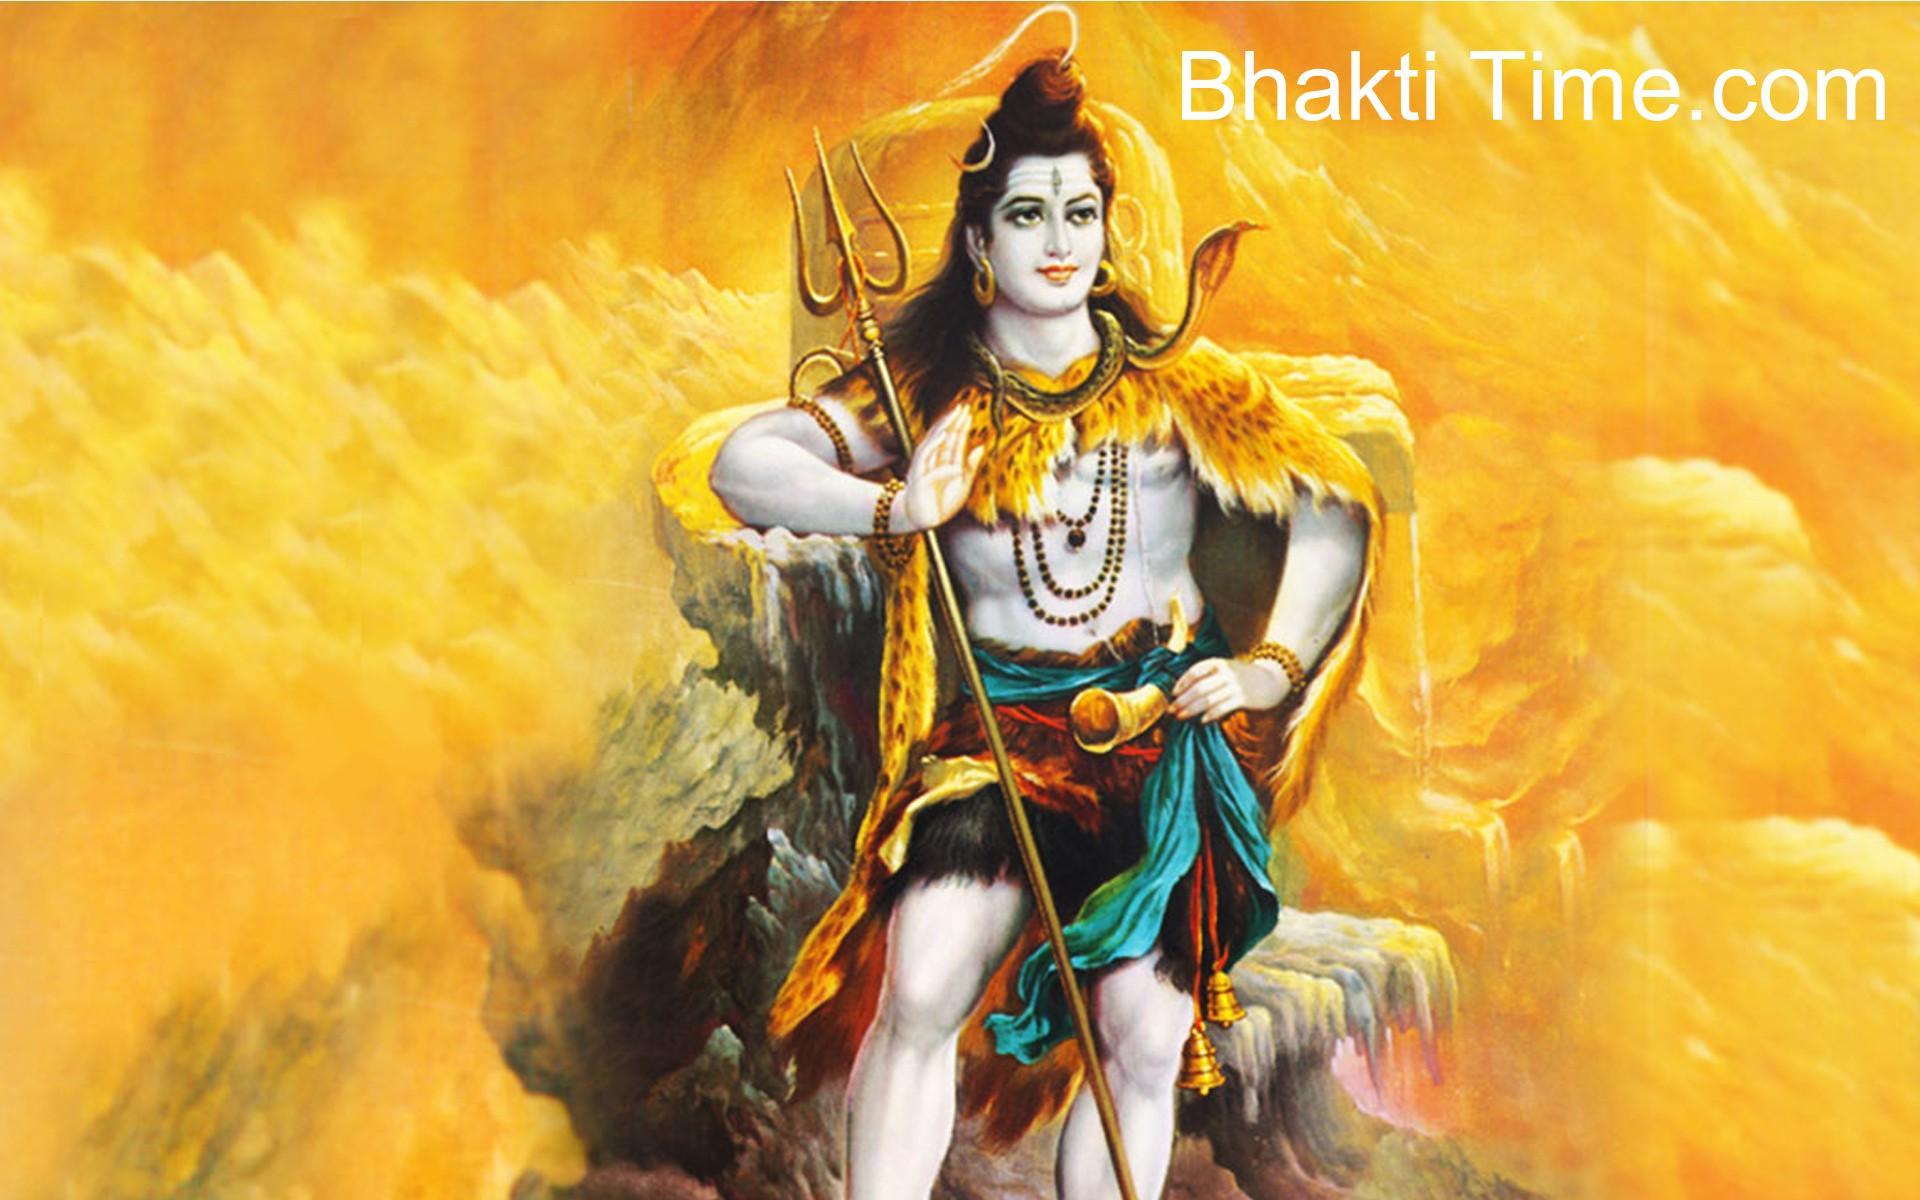 Bhakti Wallpaper 3d Hd Download Top 10 Lord Shiva Wallpapers Bhakti Time